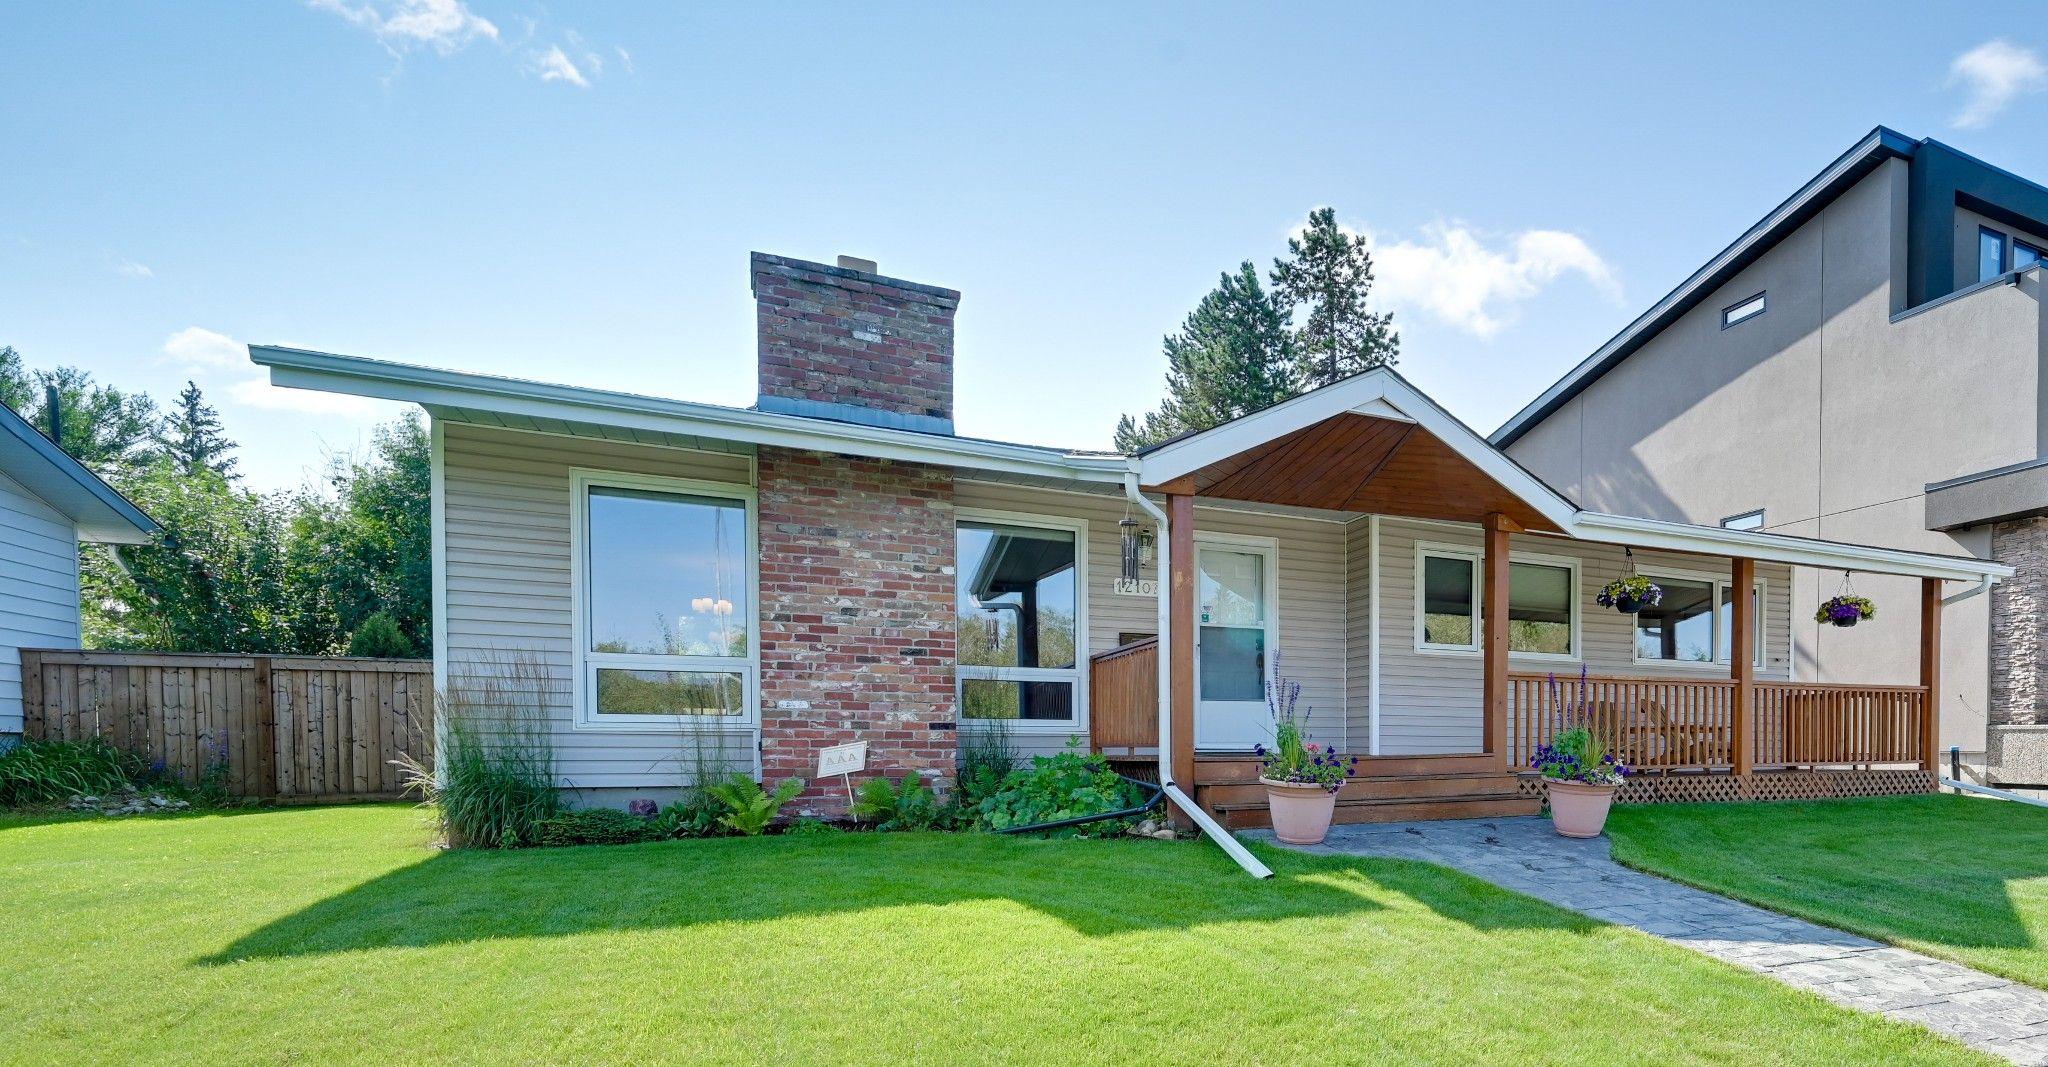 Main Photo: 12107 Aspen Drive in Edmonton: House for sale